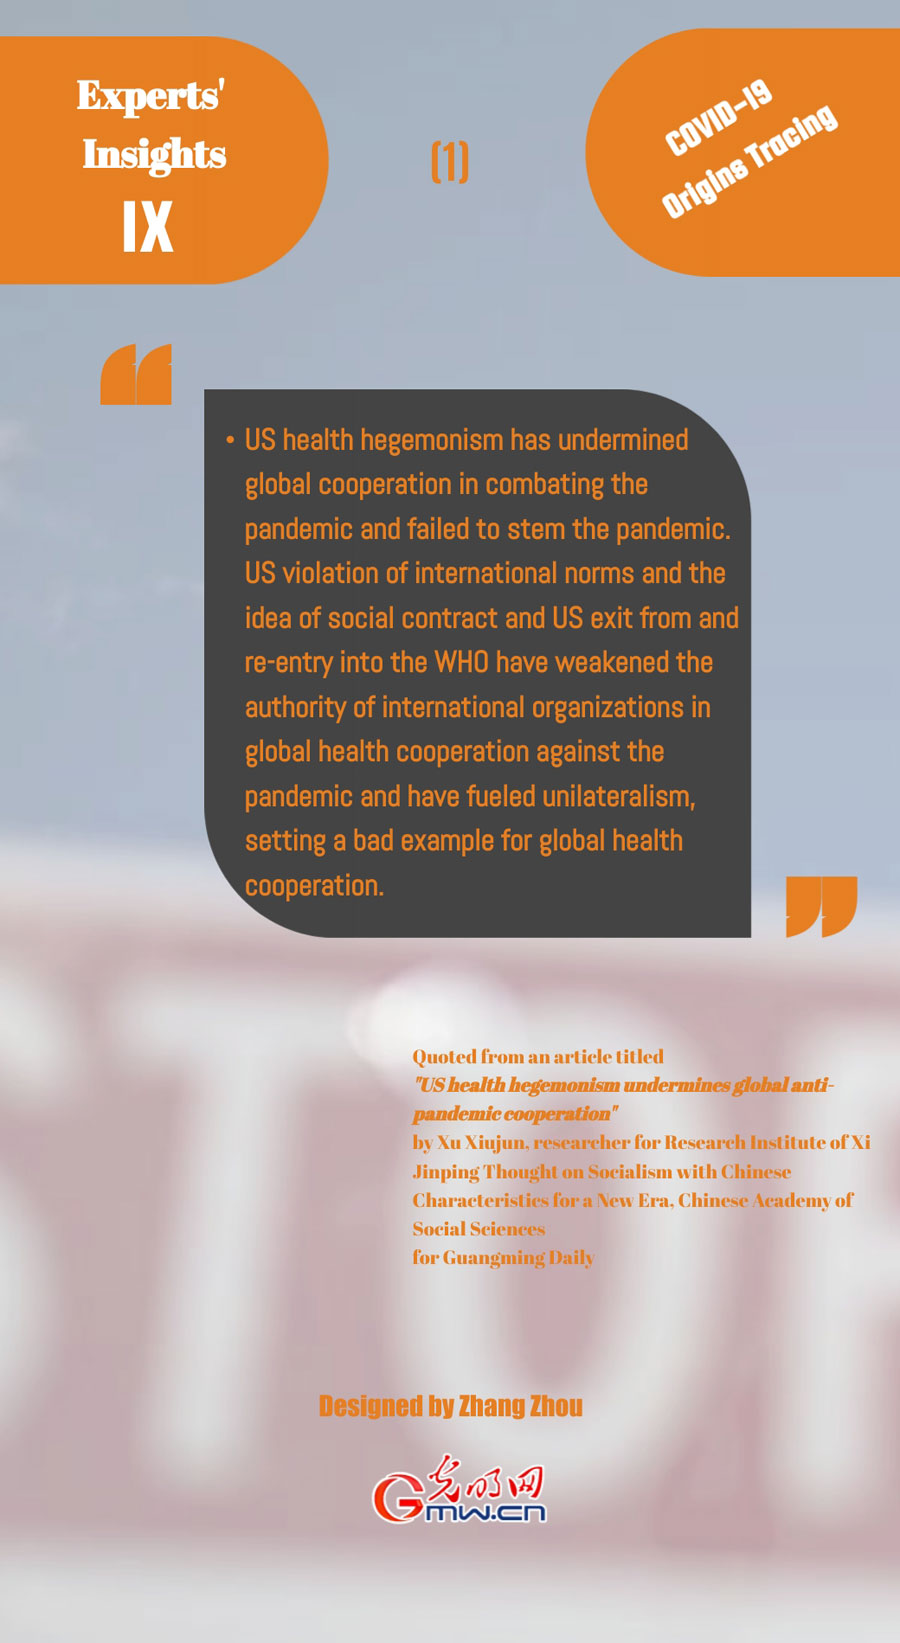 Experts' Insights IX: US health hegemonism undermines global anti-pandemic cooperation